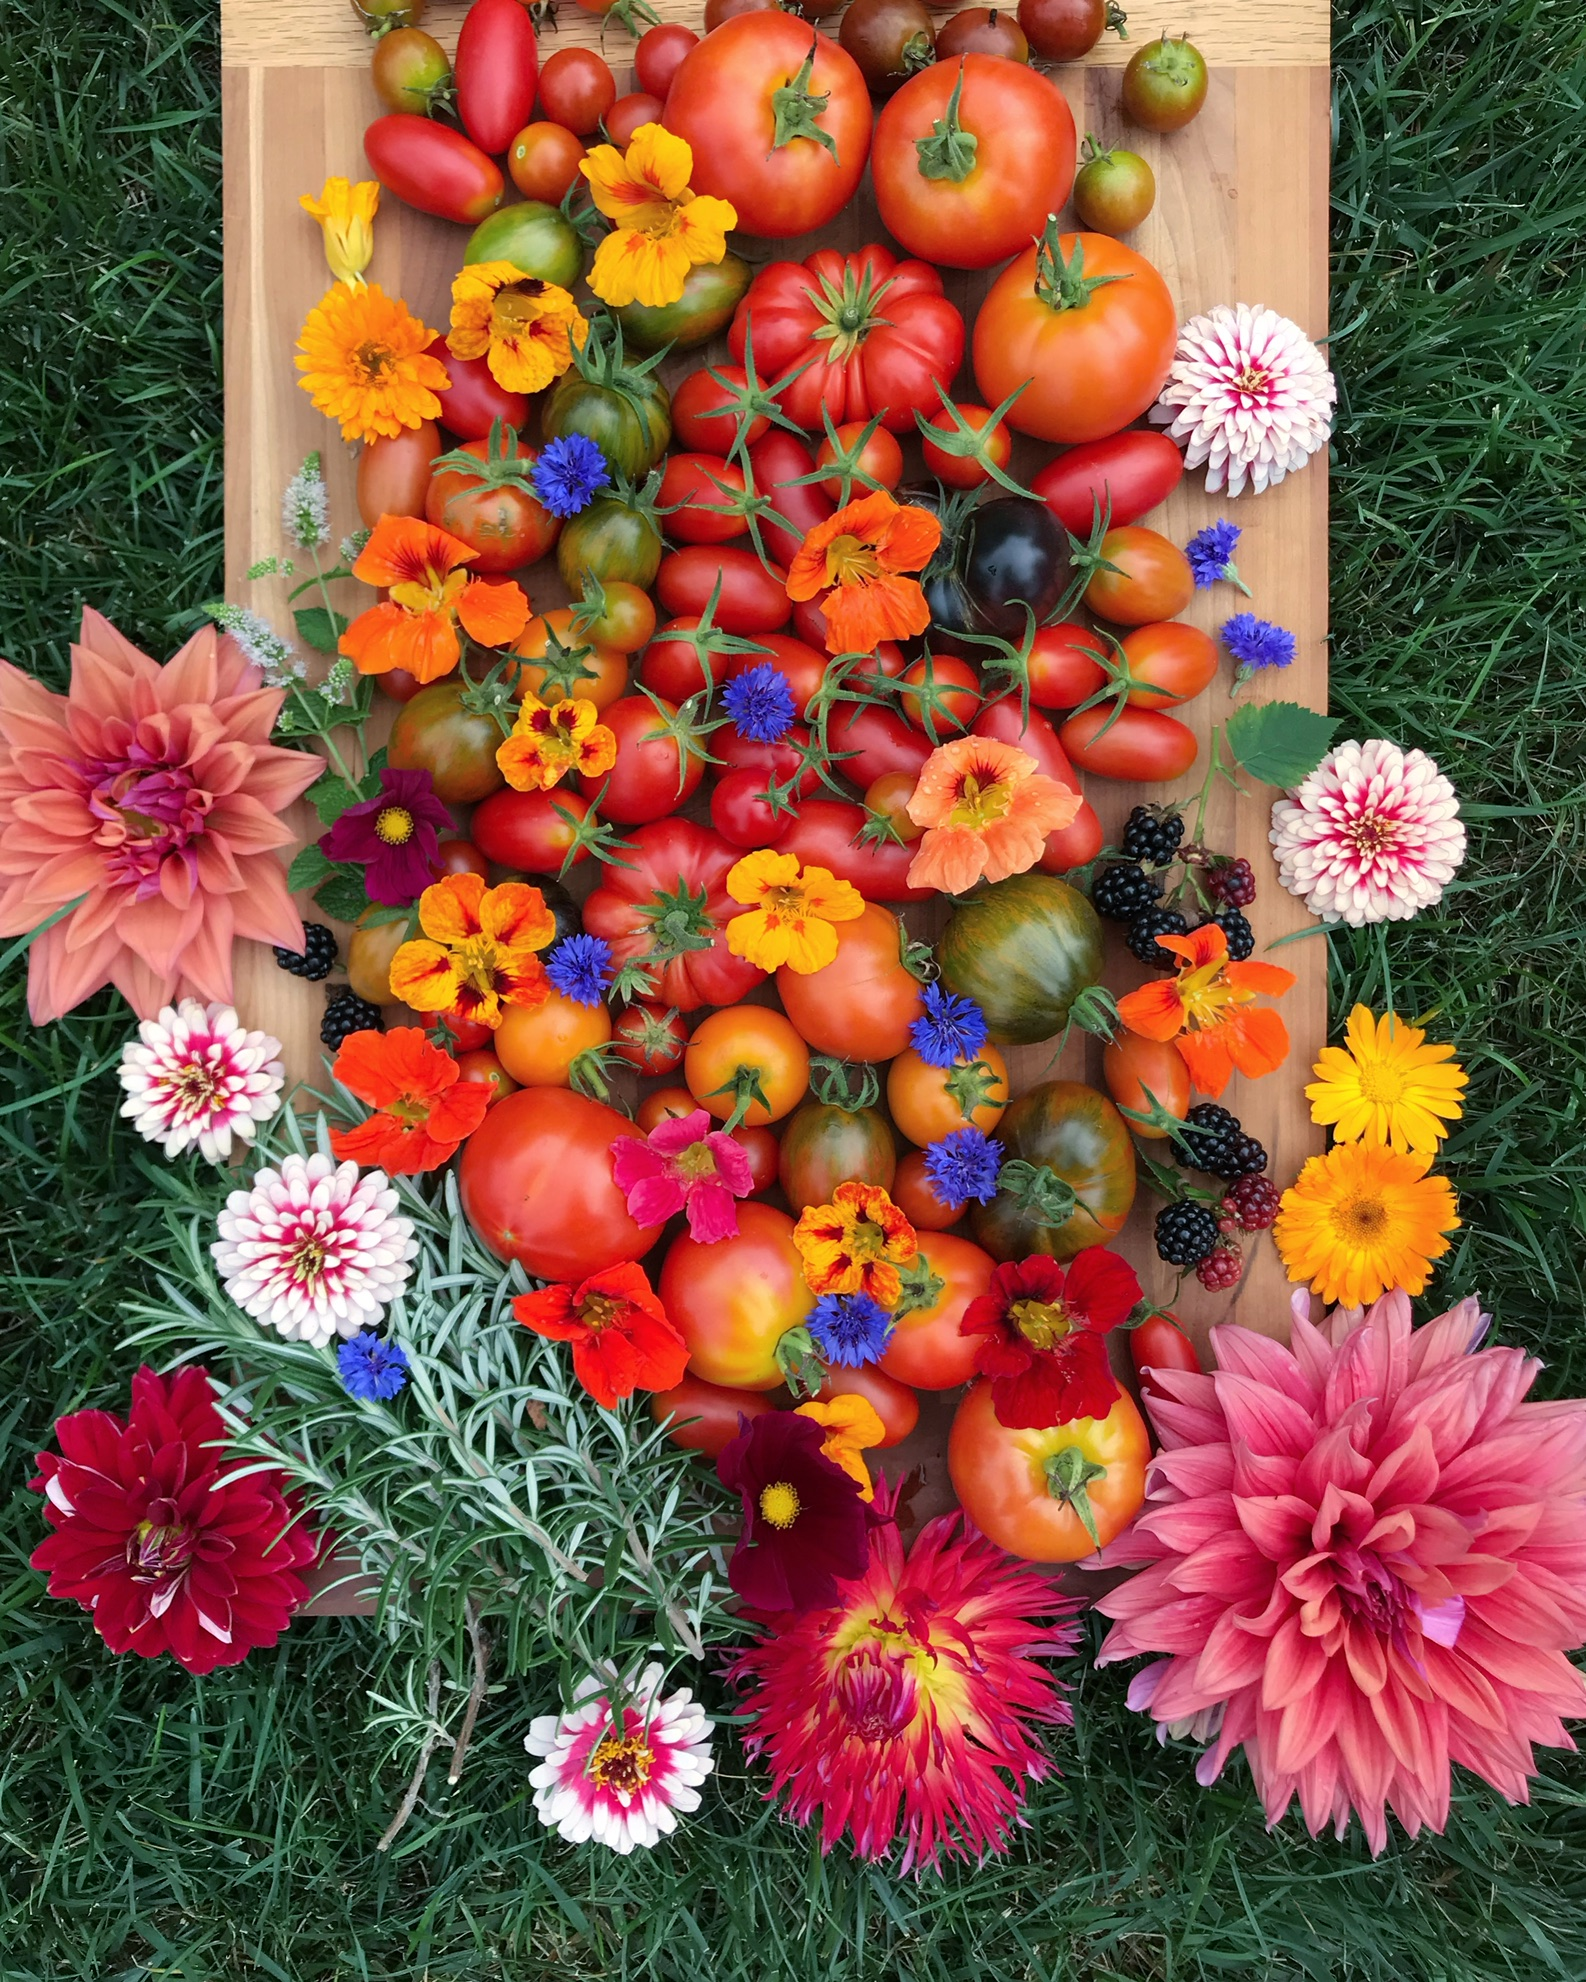 Summer harvest display by Sara Gasbarra